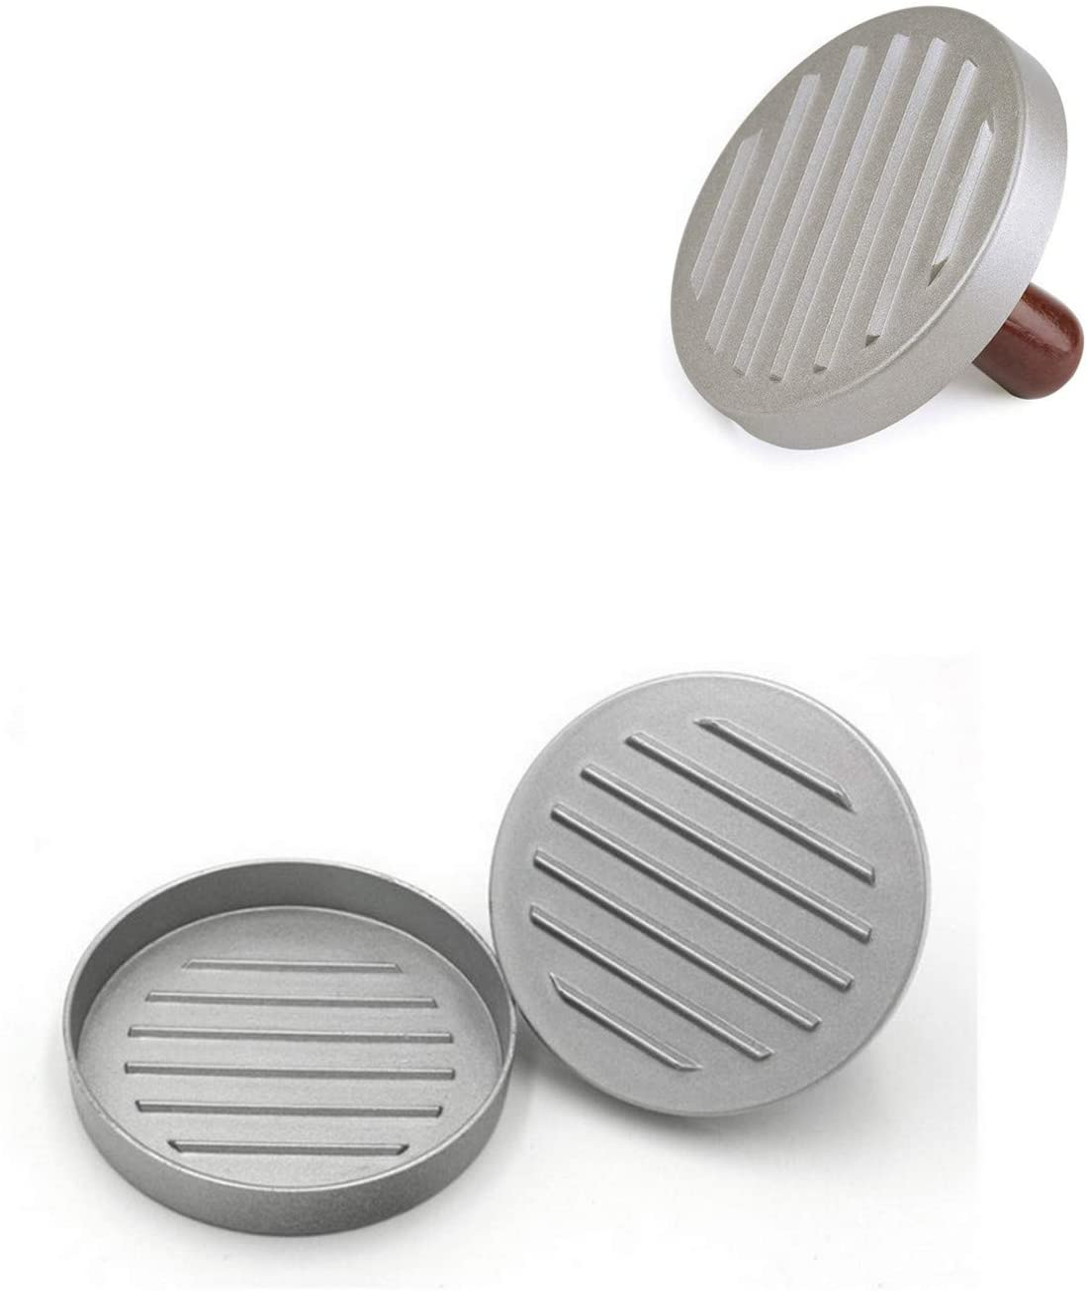 Non Stick Patty Mould Jsdoin Burger Press Aluminum Hamburger Patty Maker Ideal for BBQ